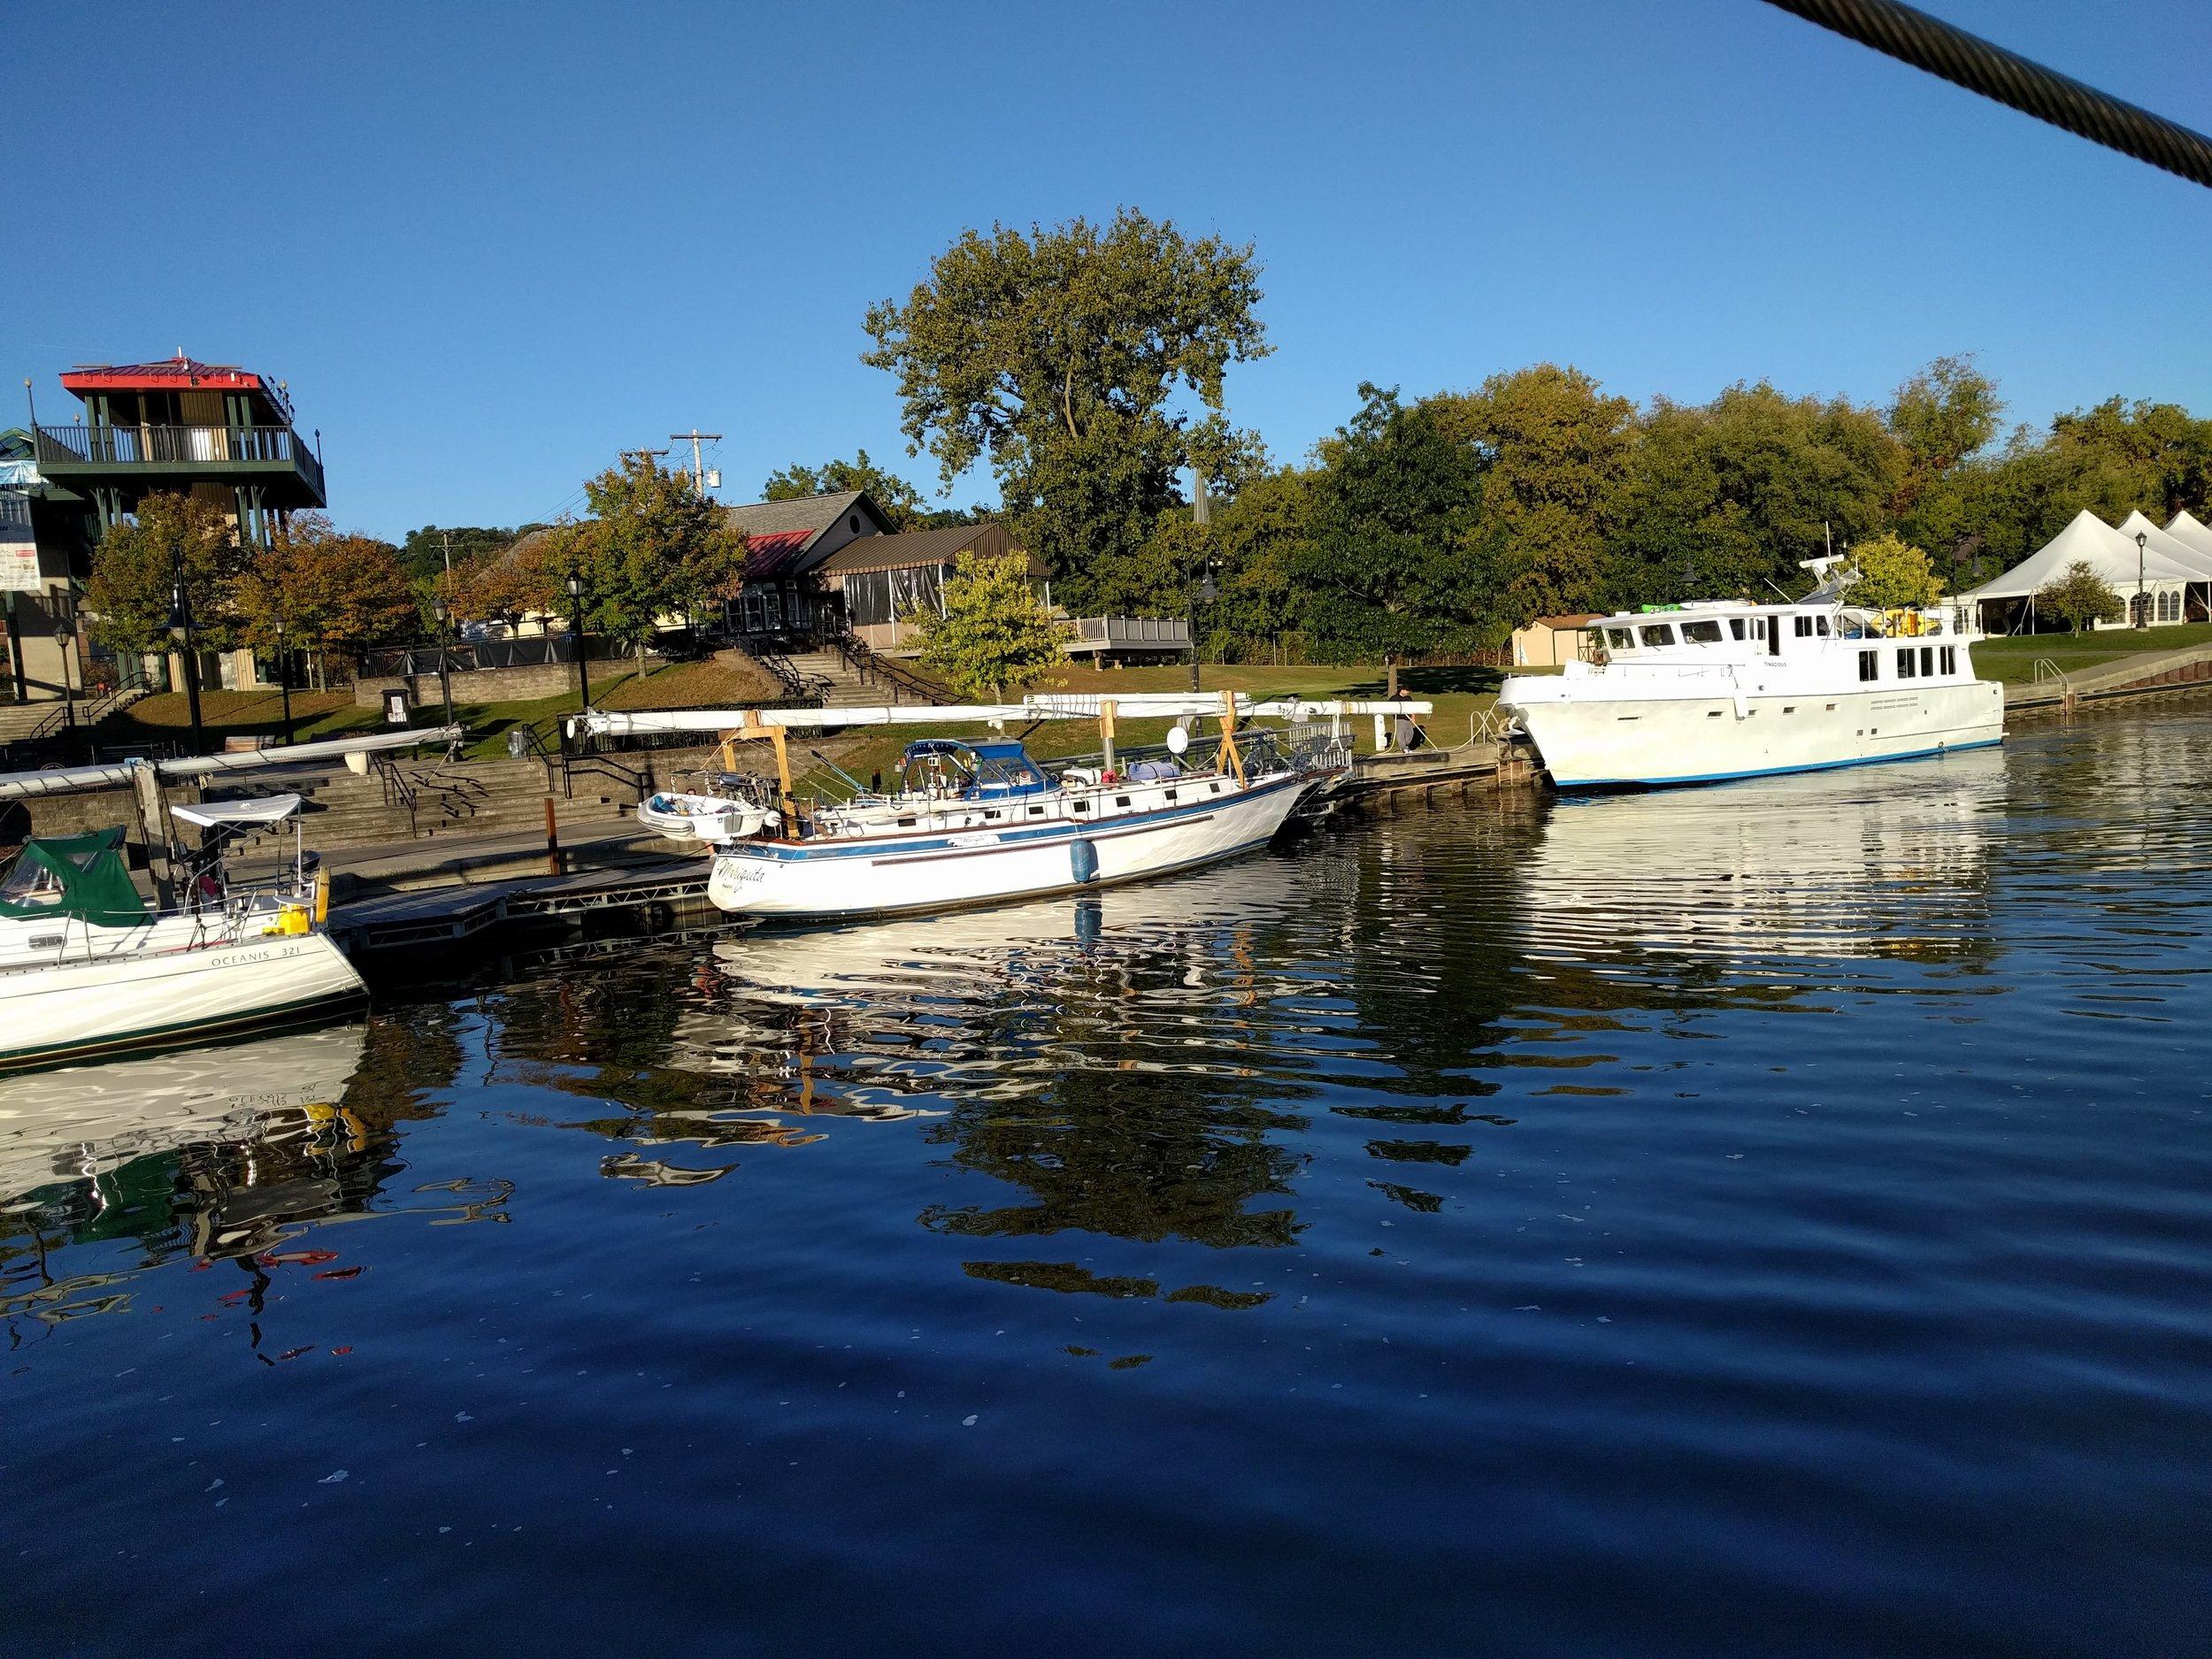 Amsterdam's marina island...beautiful!